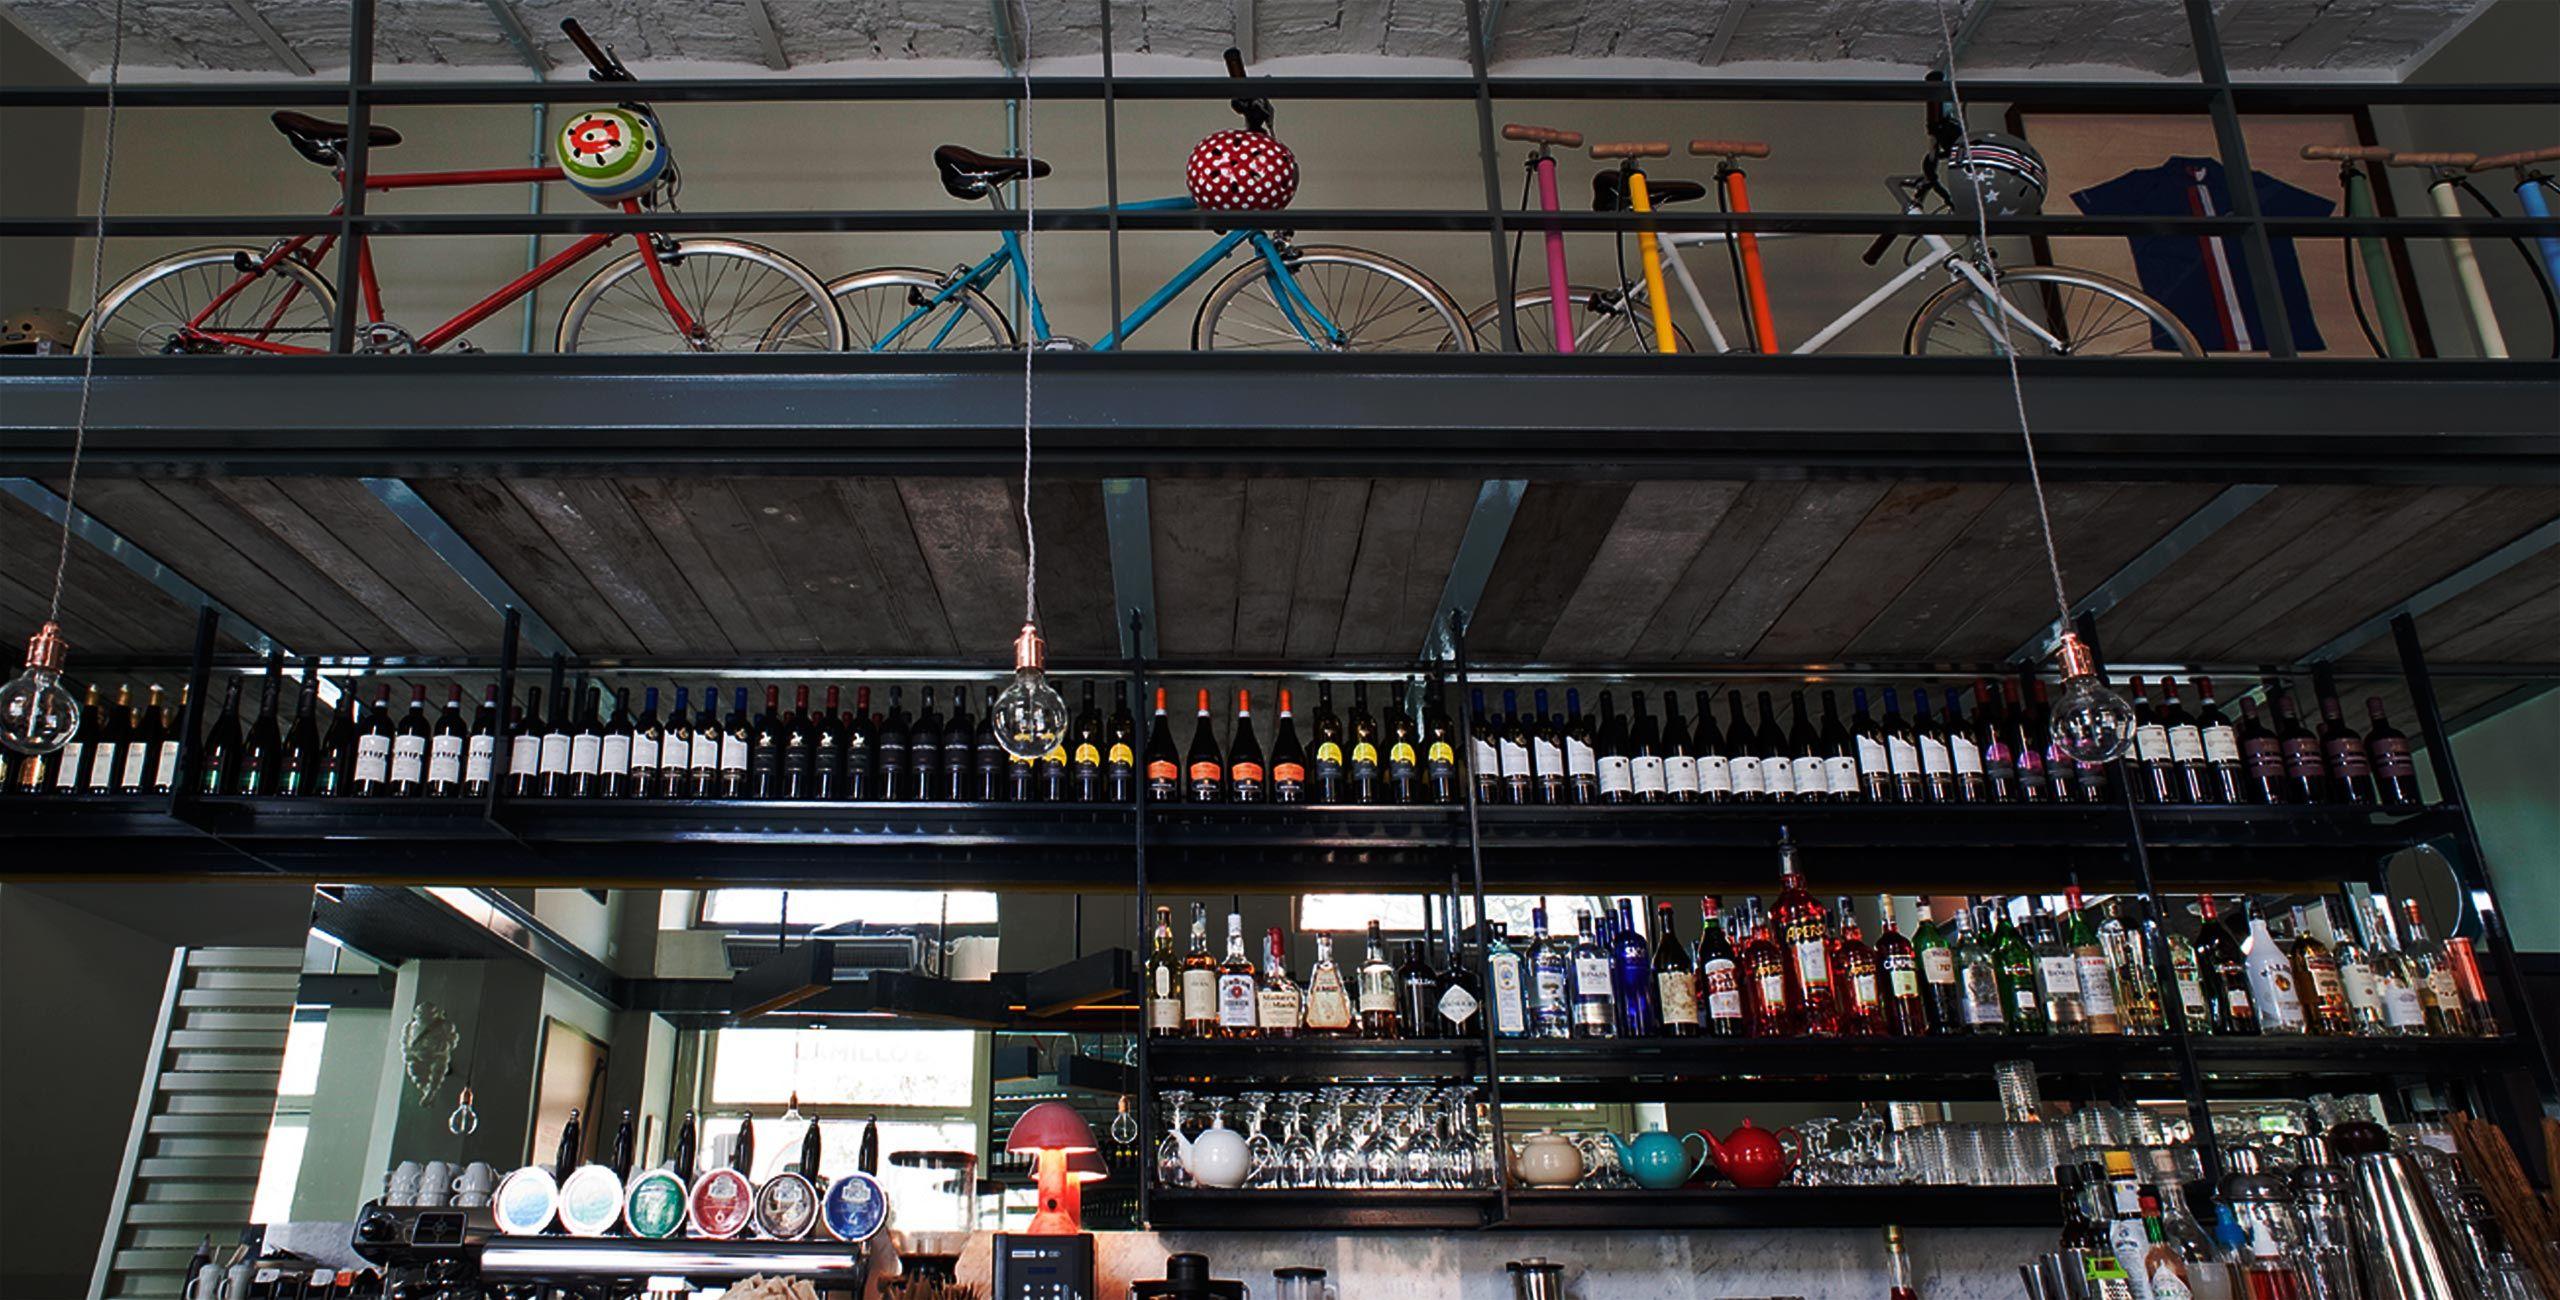 sfondo-pag3-vista-bancone-bici